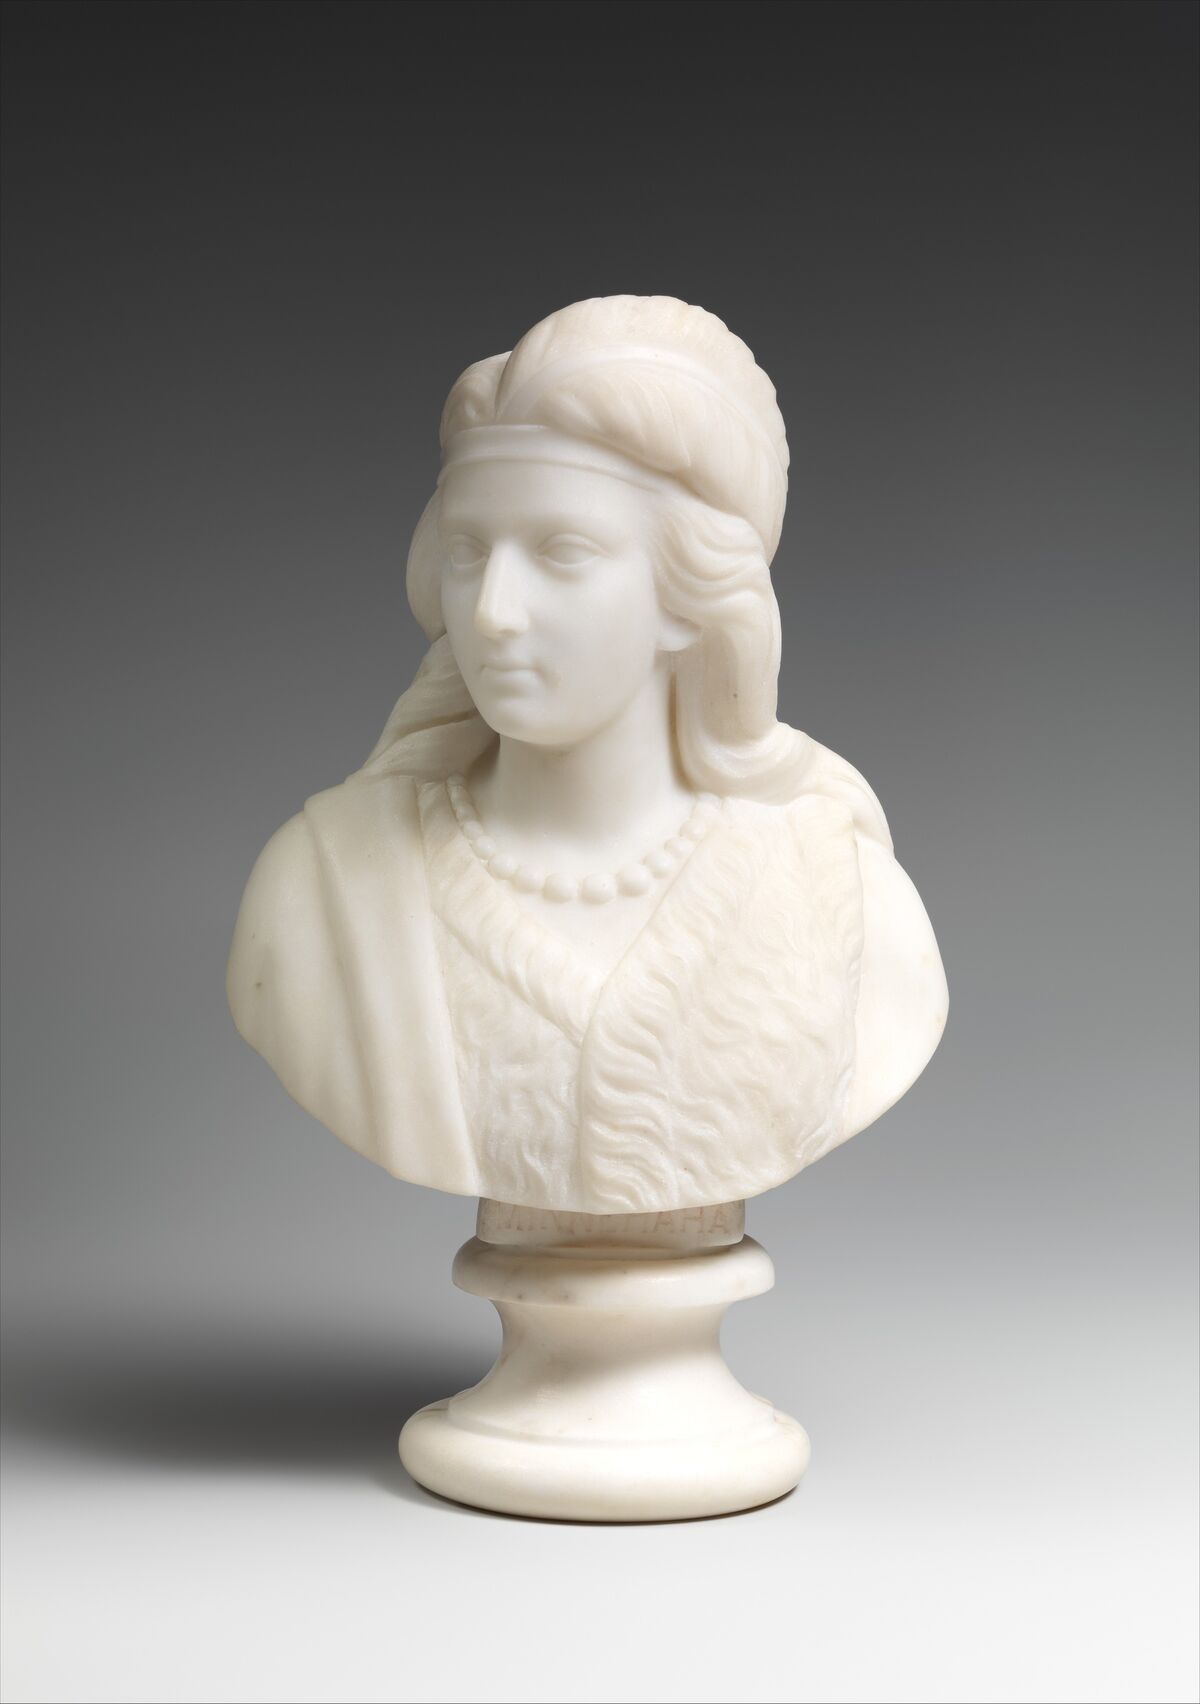 Edmonia Lewis, Minnehaha, 1868. Courtesy of The Metropolitan Museum of Art.